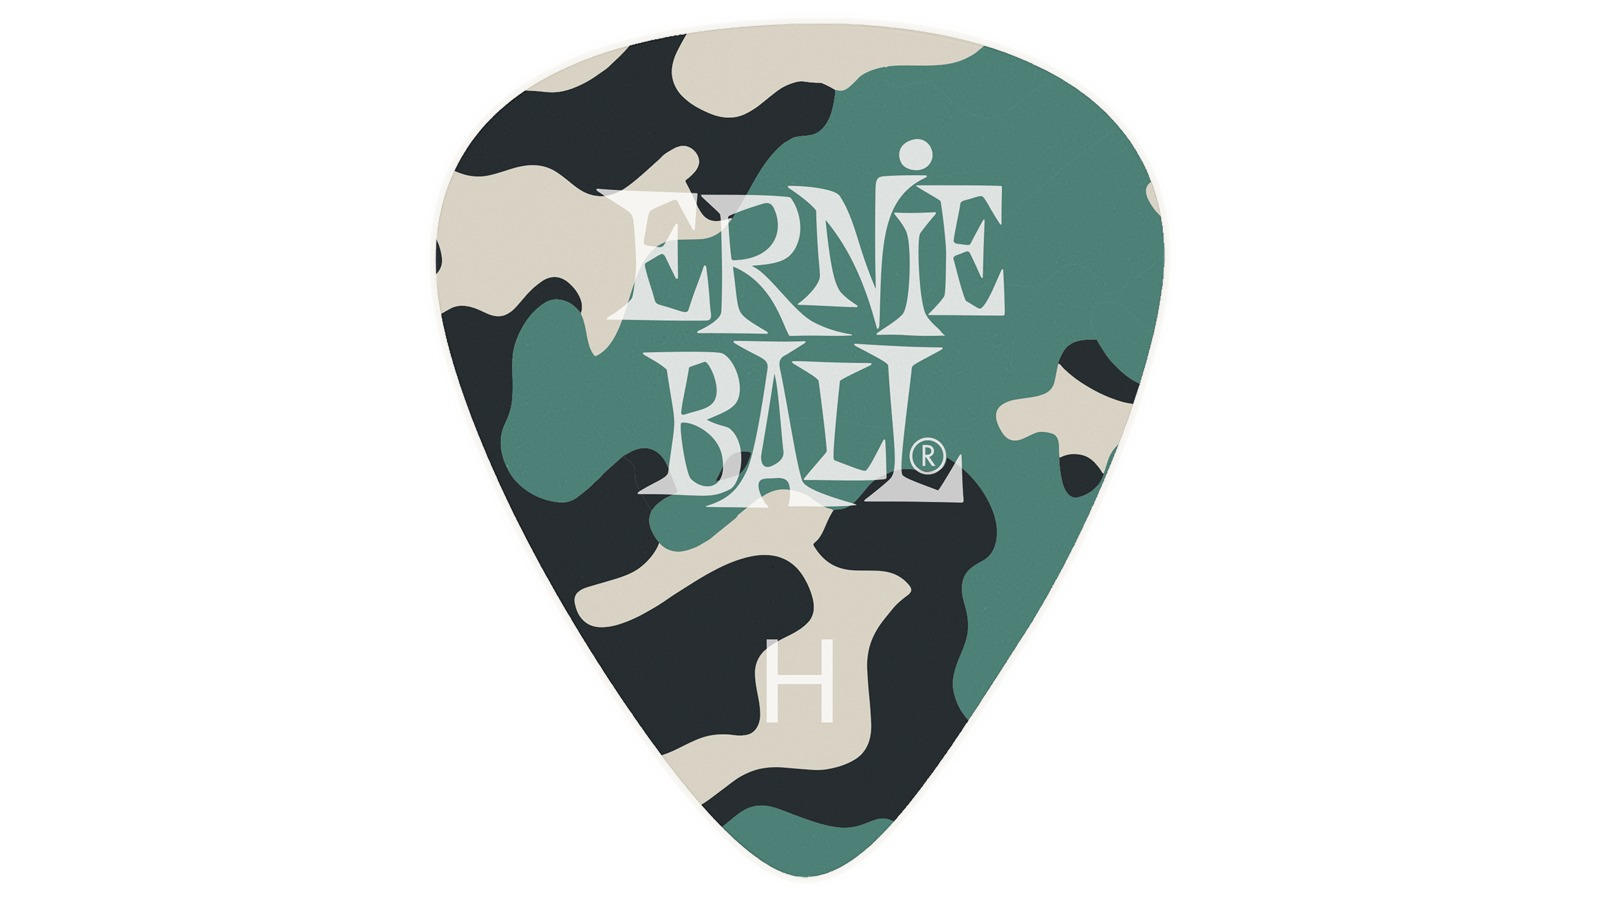 Ernie Ball EB9223 Celluloid Picks Camo 12er Set Heavy